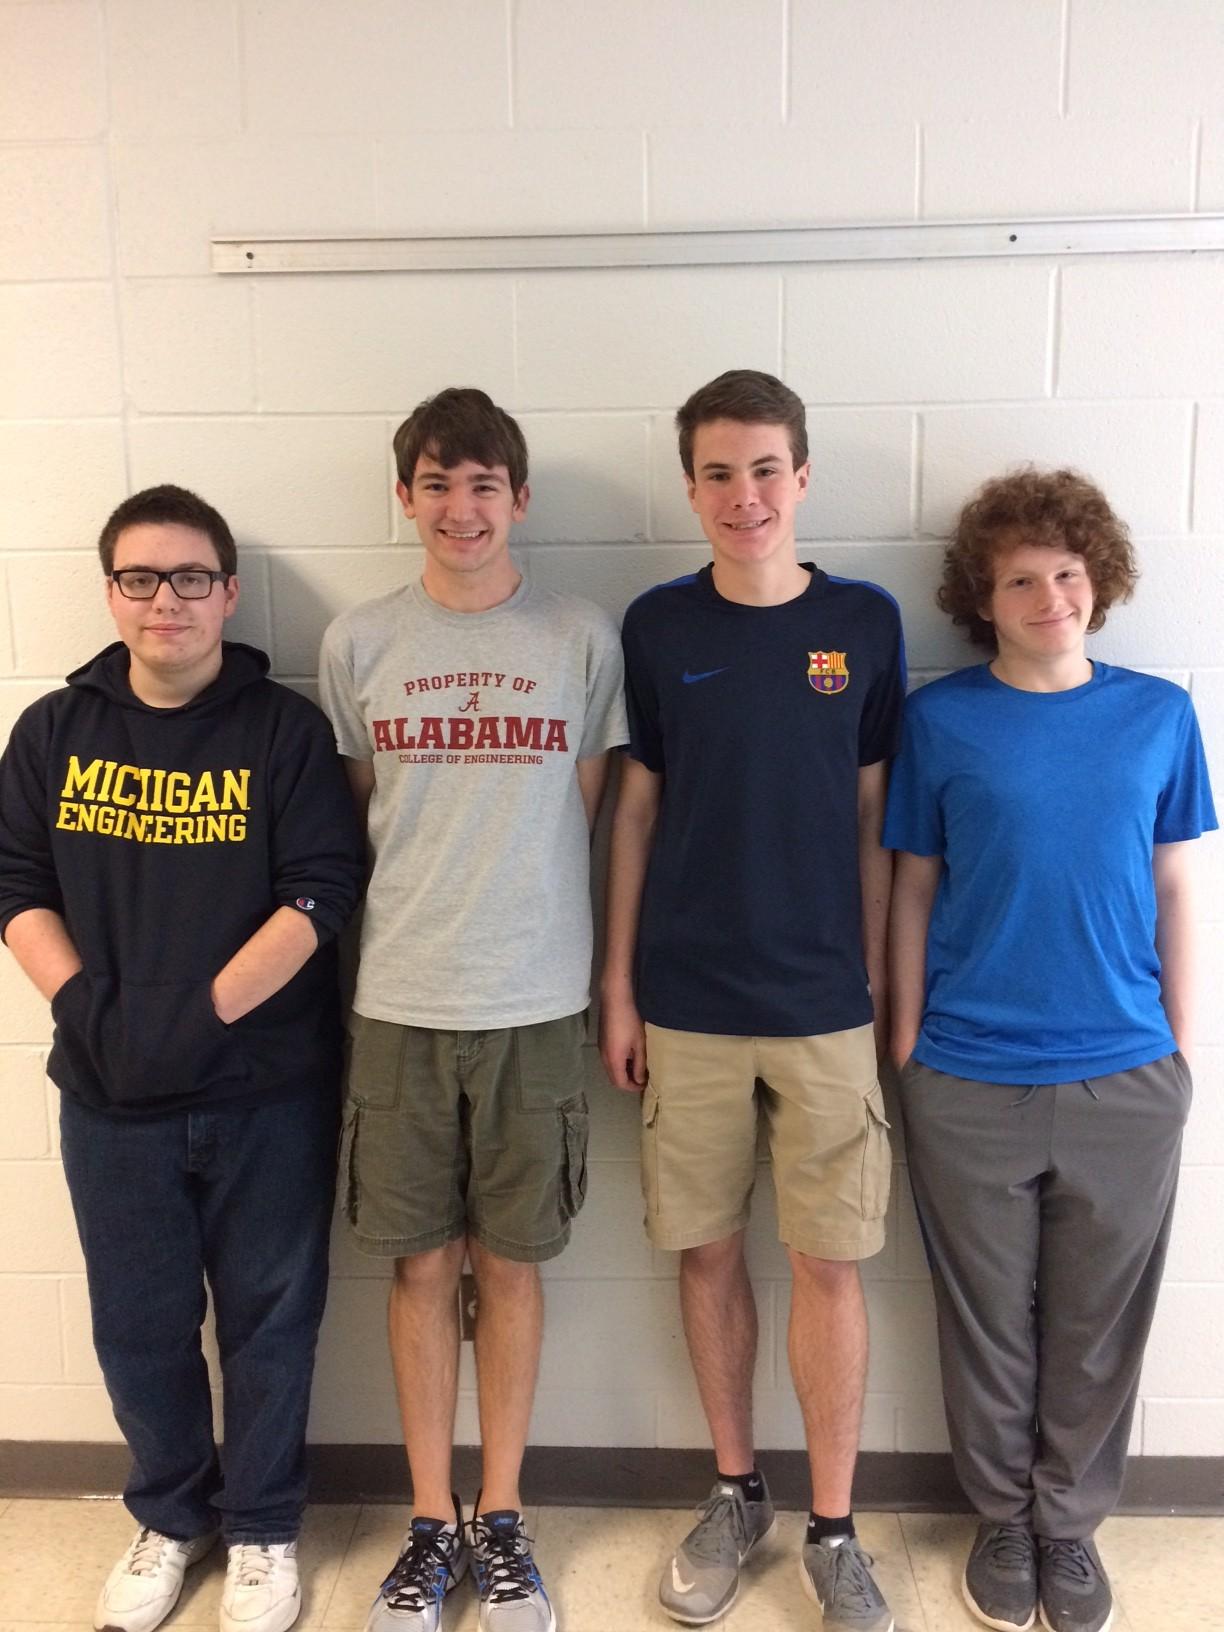 Campbell County High School - Colton Graham, Anthony Schwarberg, Joel Sebastian, Mitchell Turner